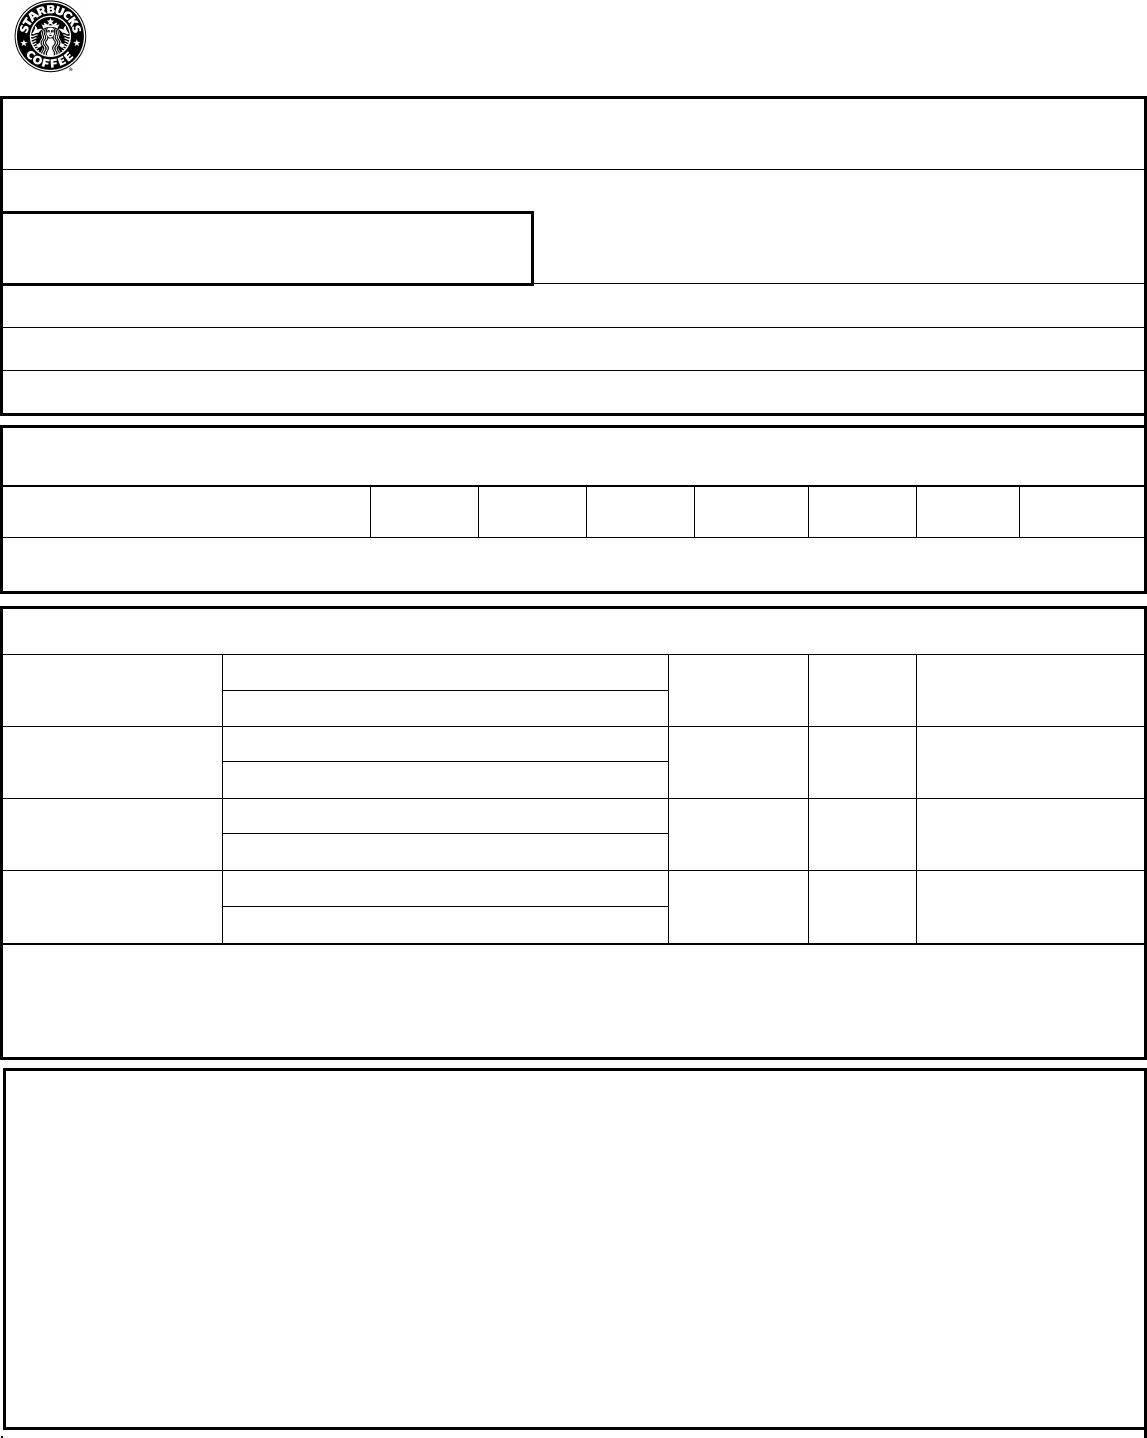 Free printable starbucks job application form falaconquin